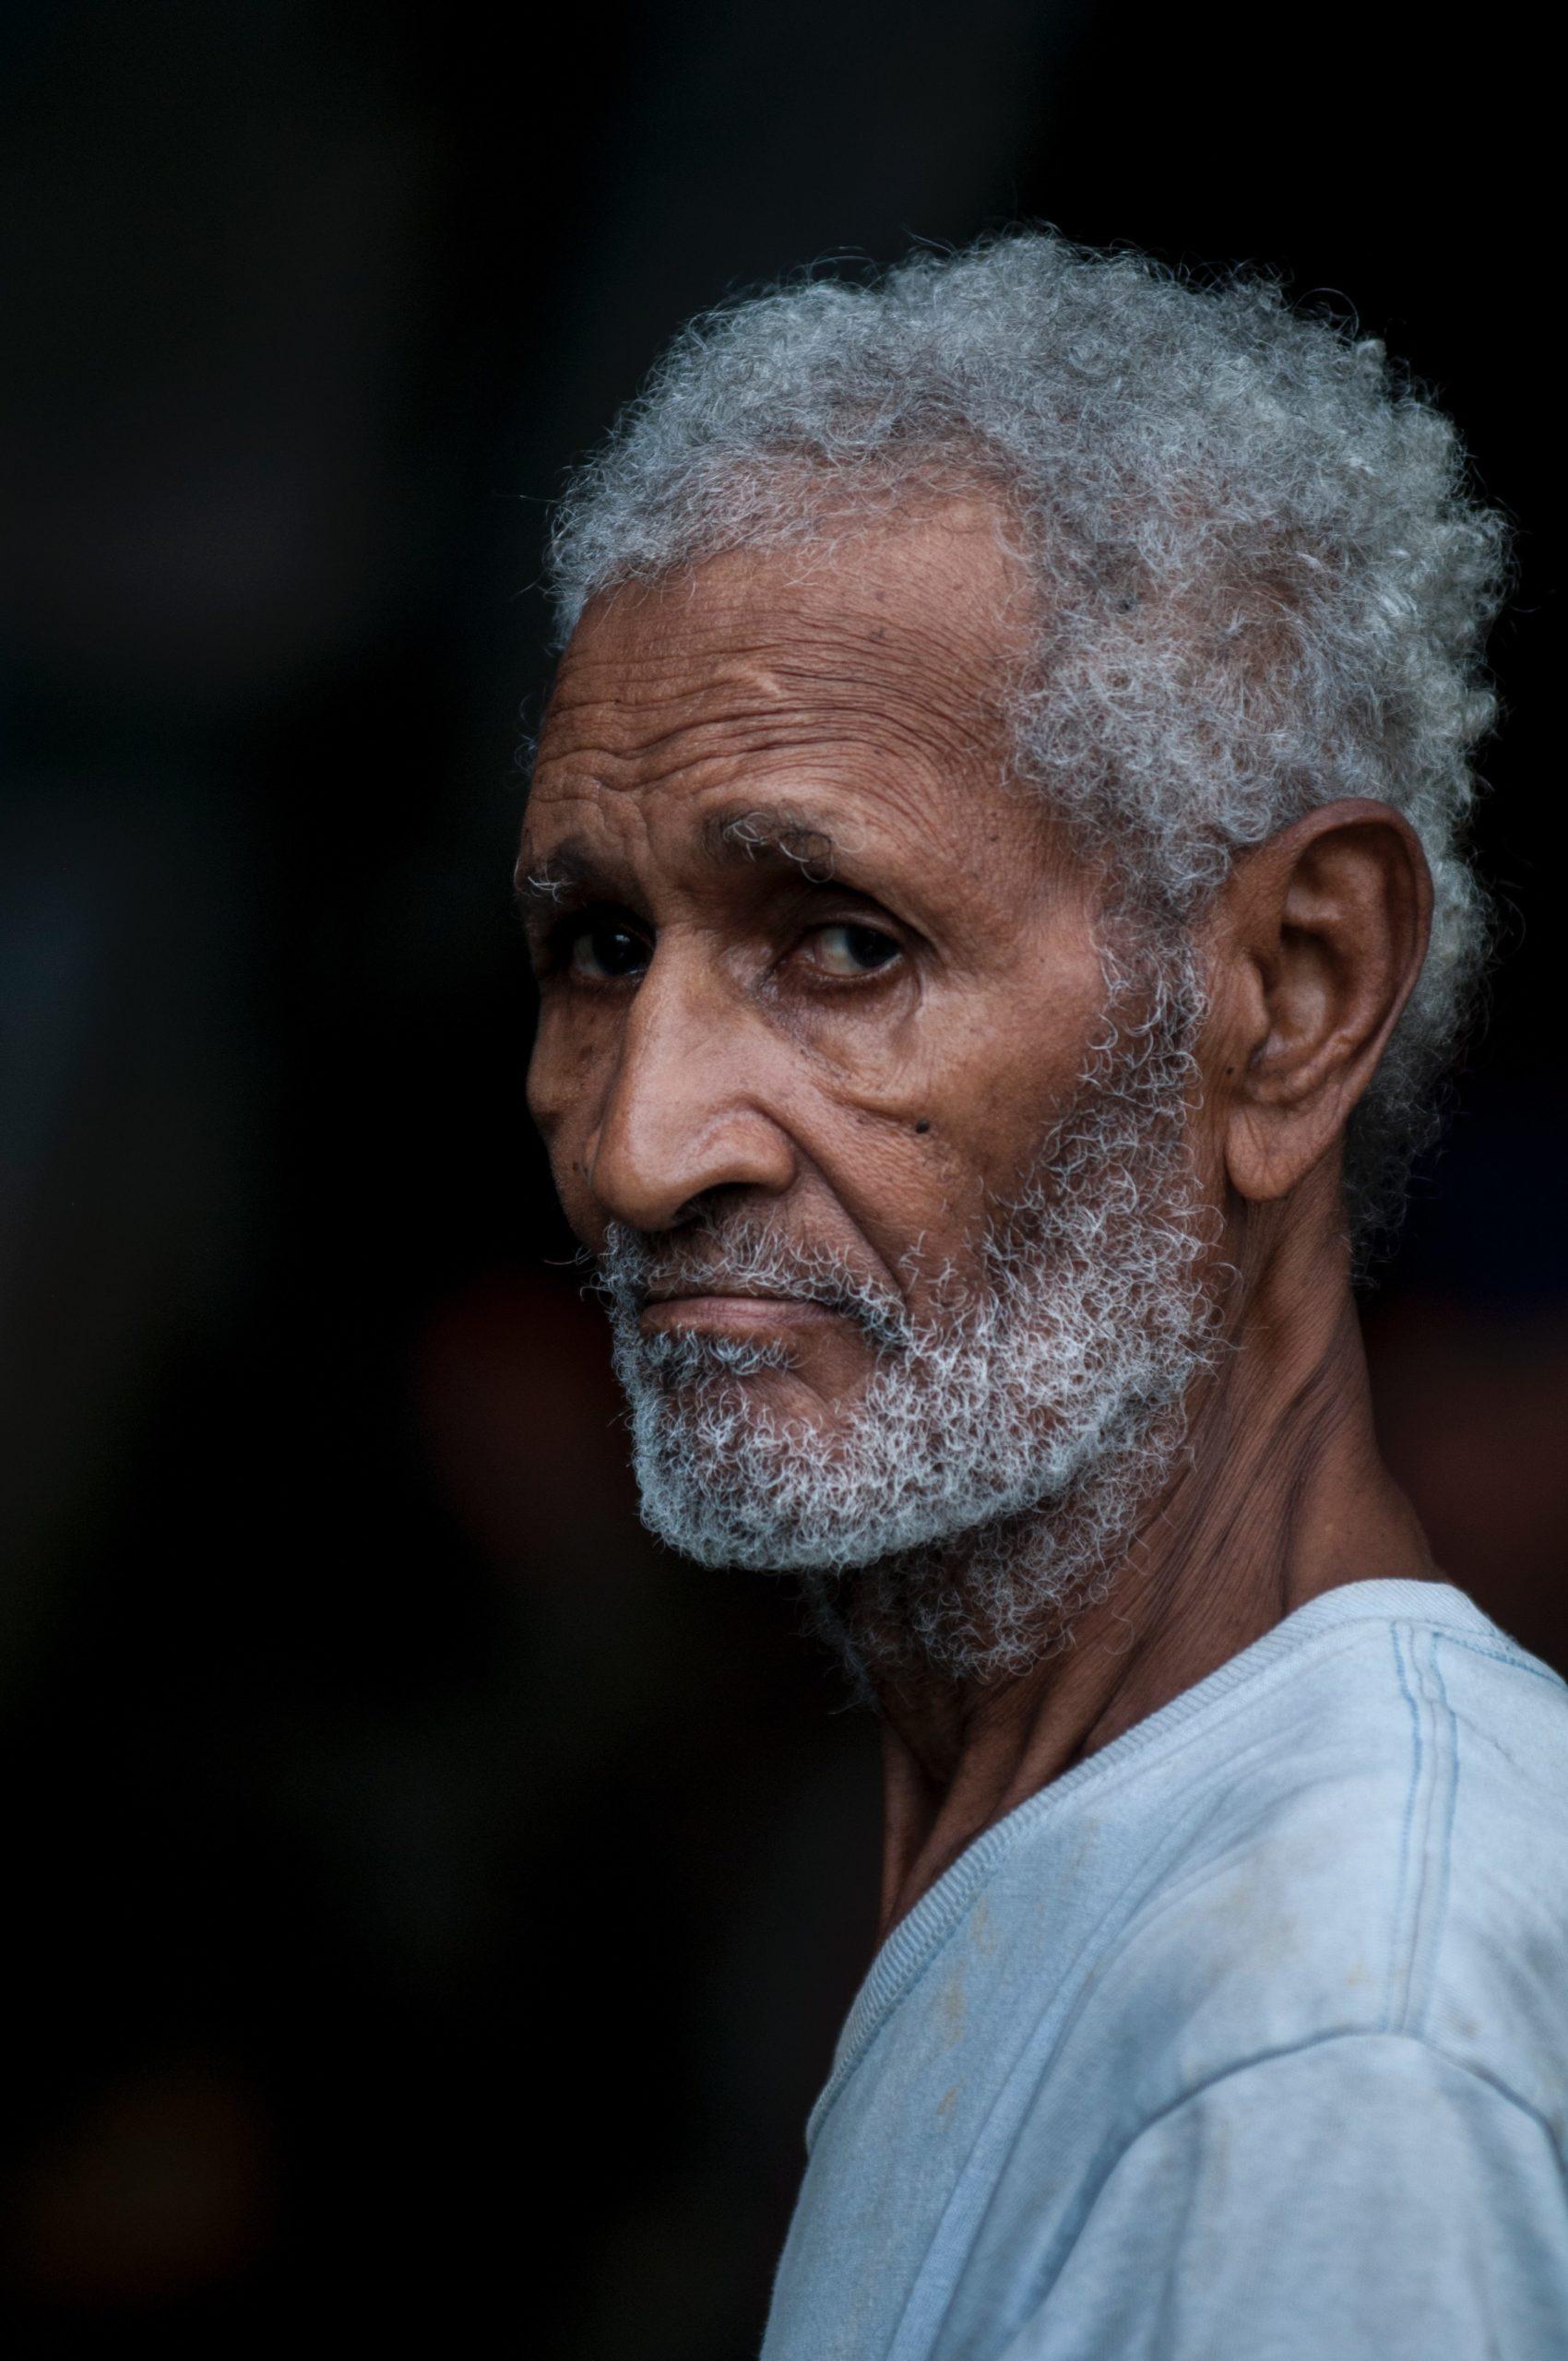 Disparities in Eye Care Among the Elderly